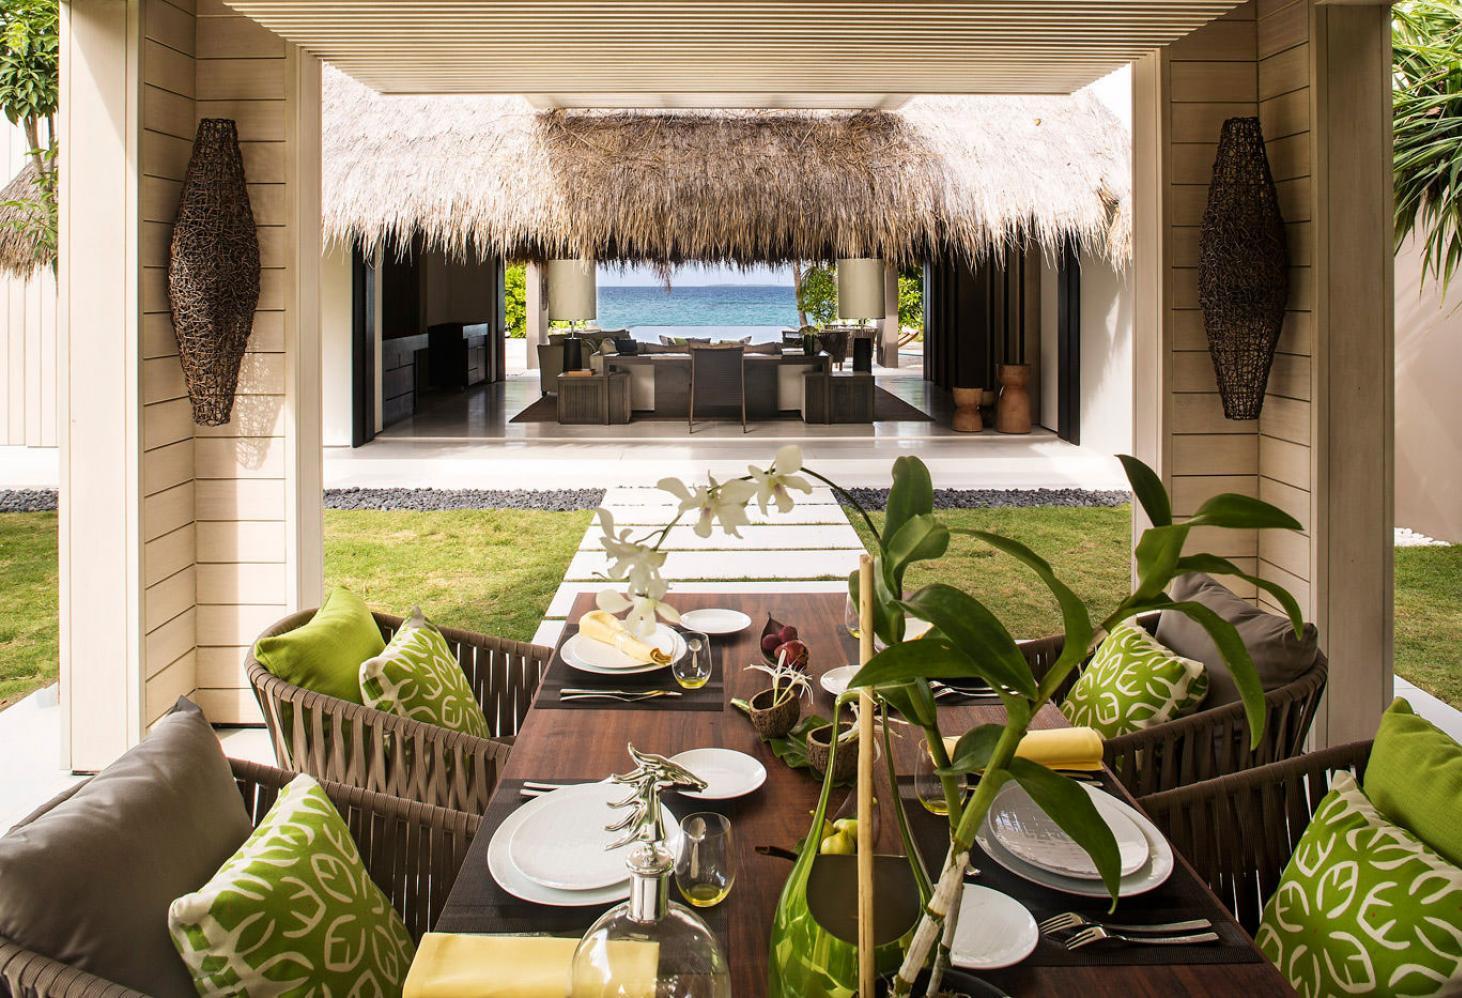 Мальдивы. Атолл Ноону. Отель Cheval Blanc Randheli Maldives  (Шевал Бланк Резорт)